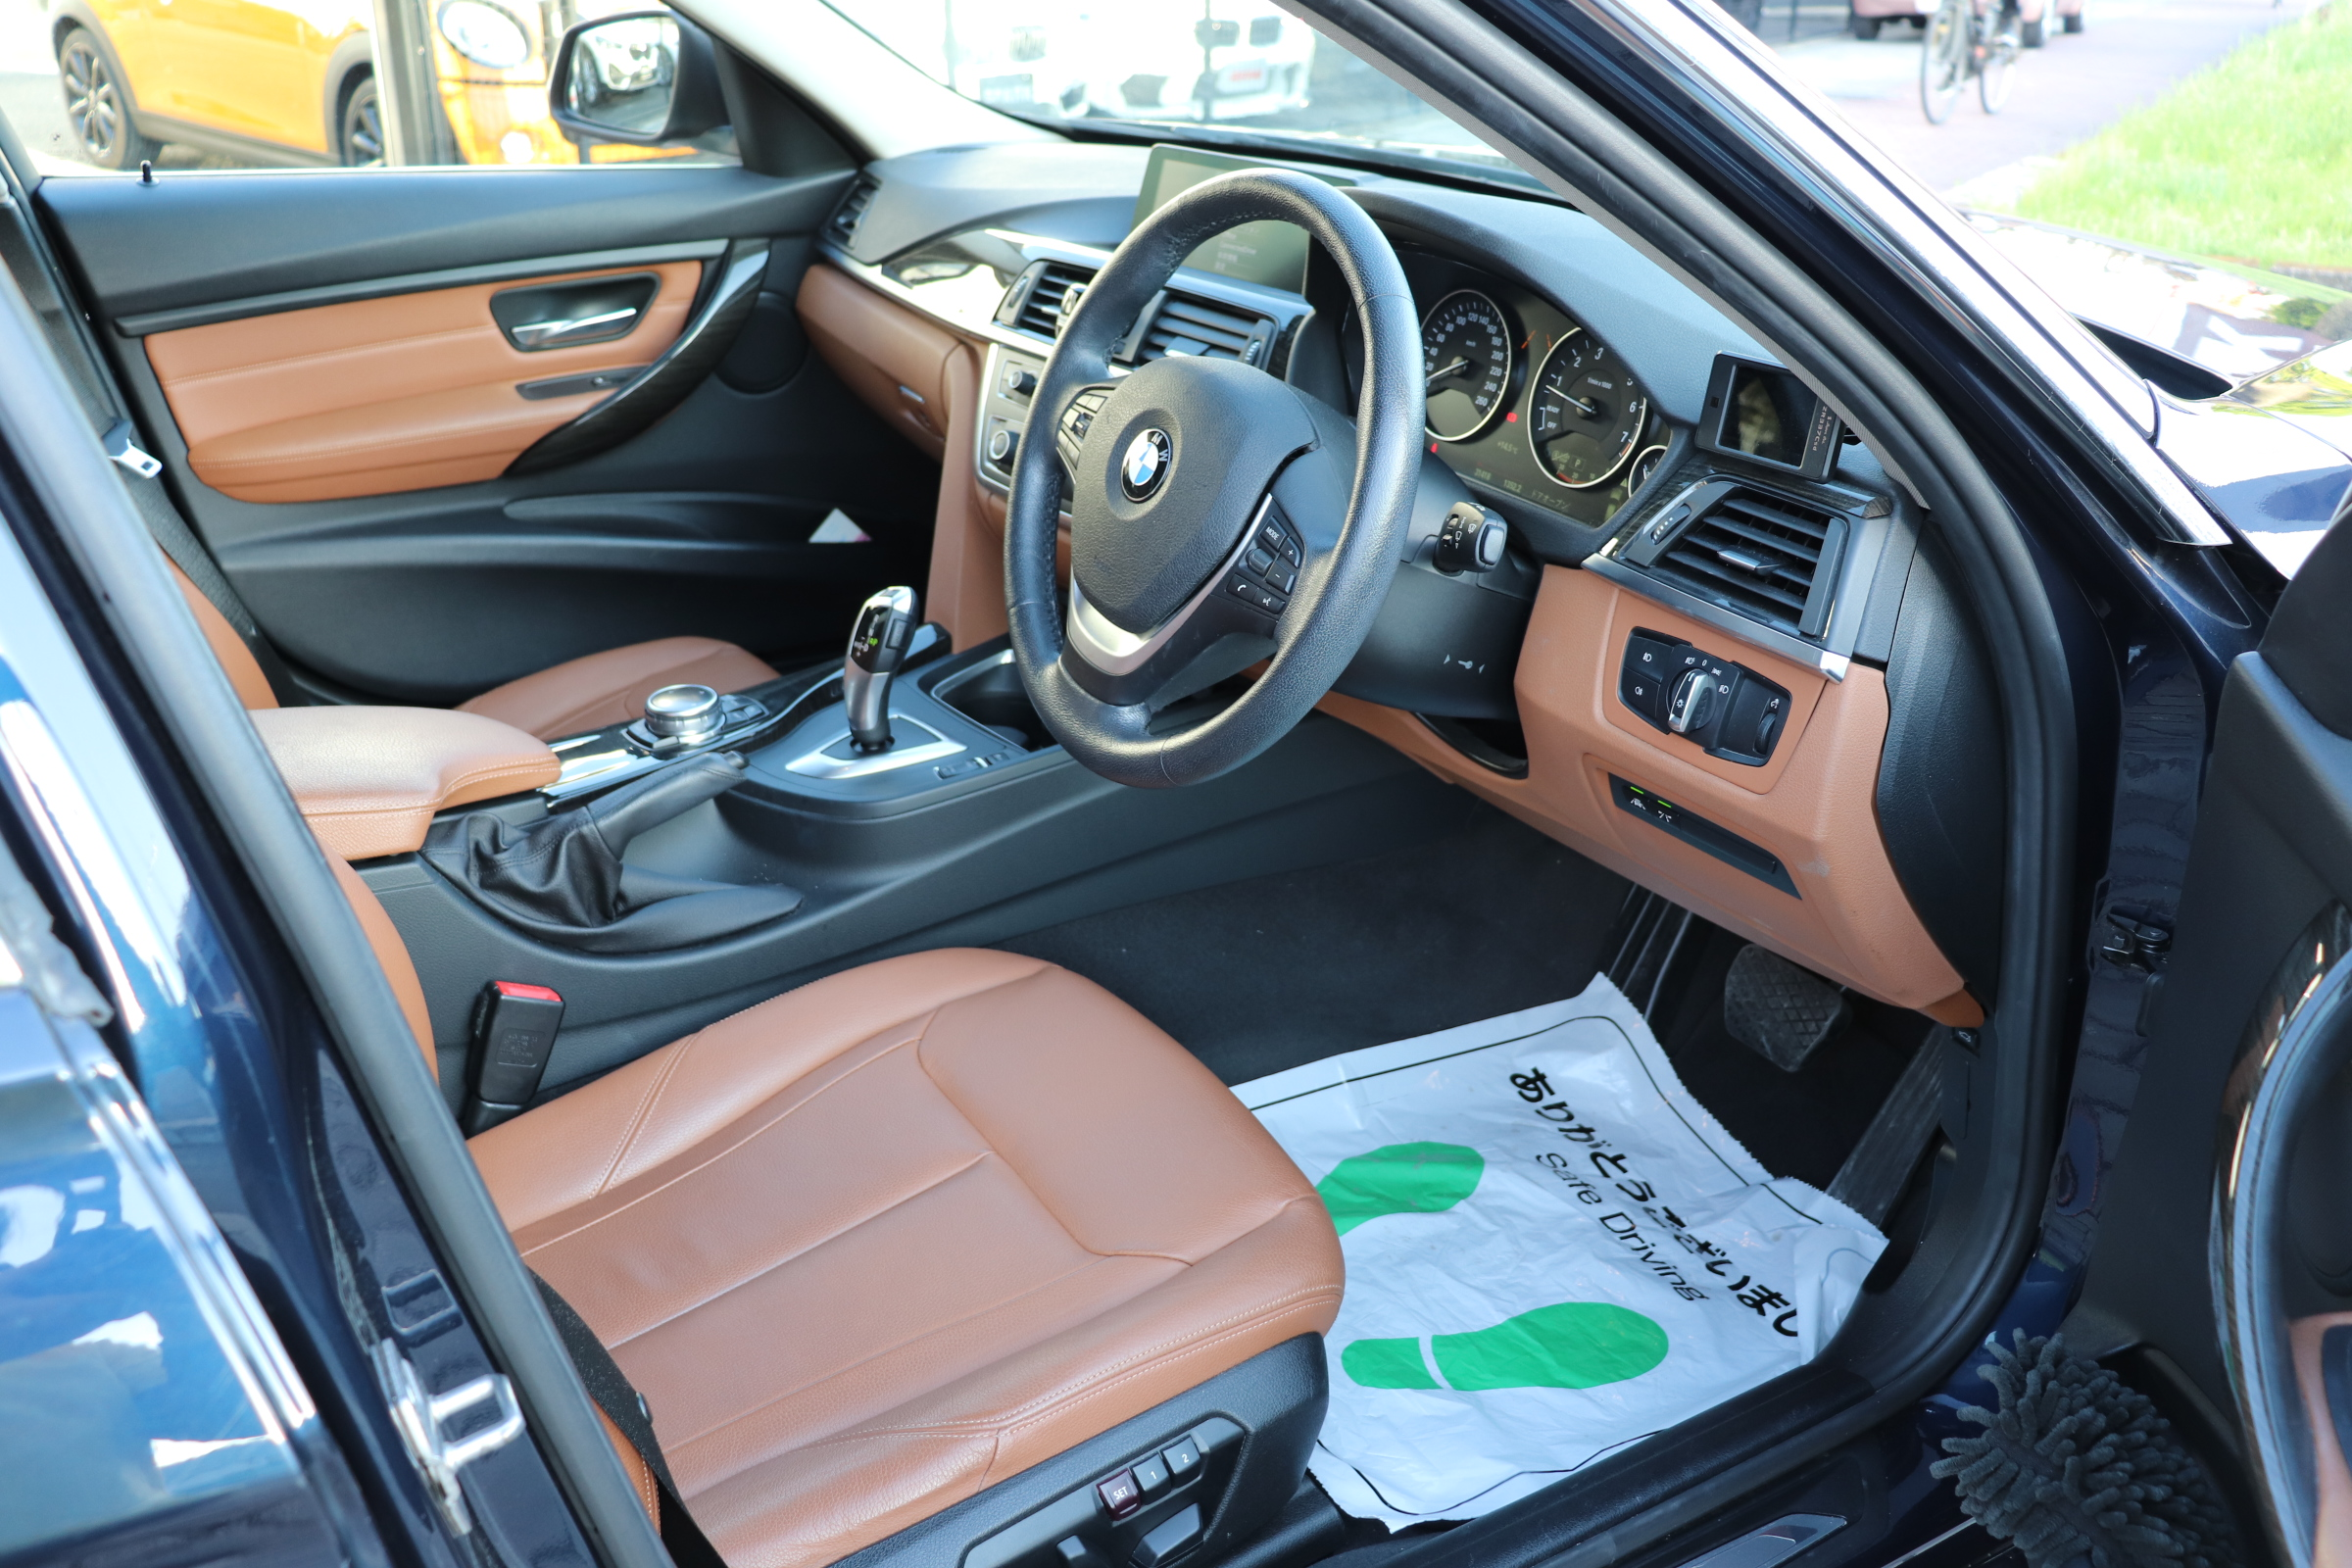 320iツーリング ラグジュアリー BEAMコンプリートカー ACC ブラウンレザーシート車両画像10